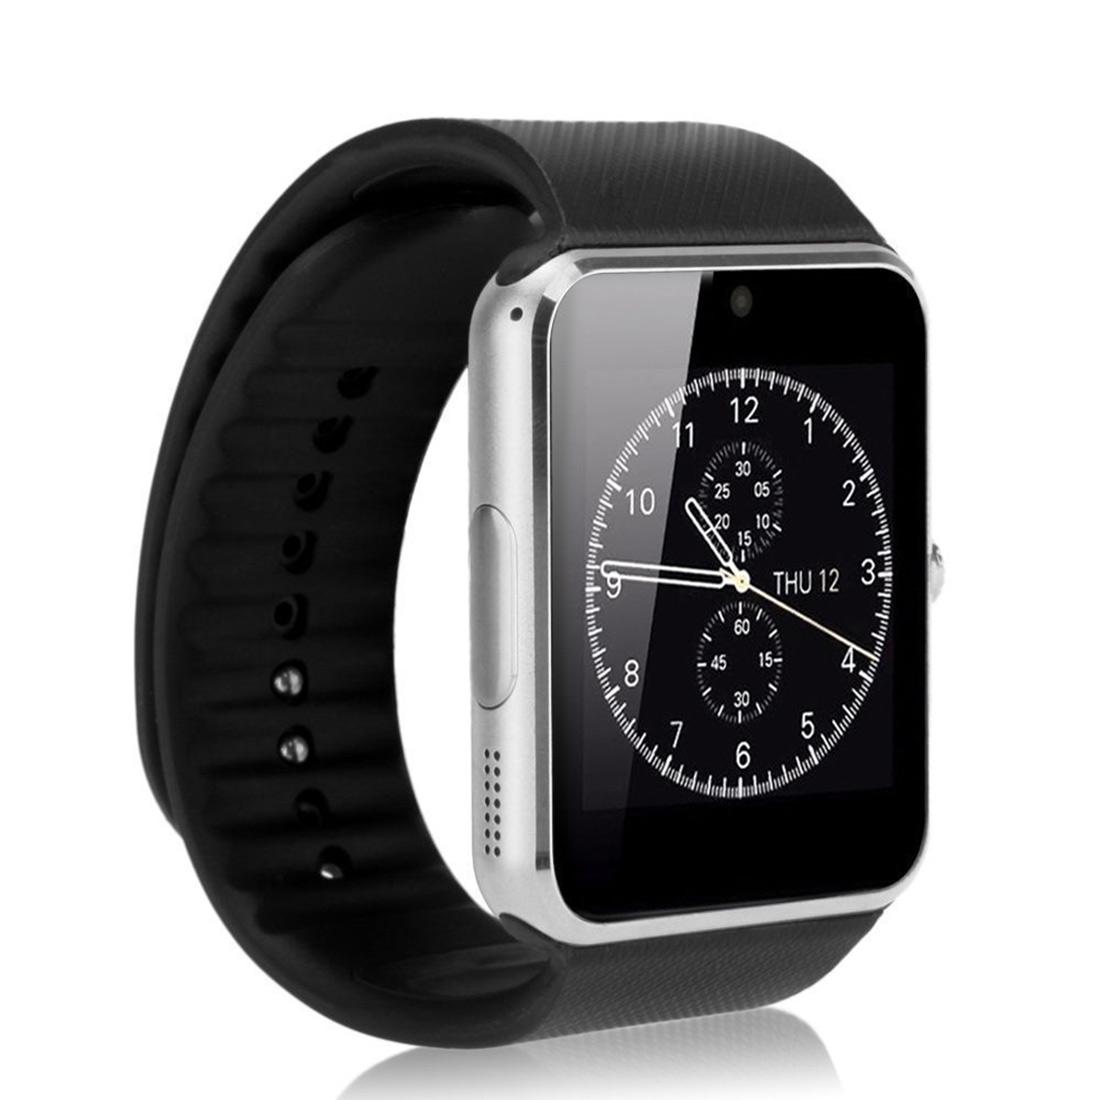 Smartwatch Bluetooth Armband Uhr - silber